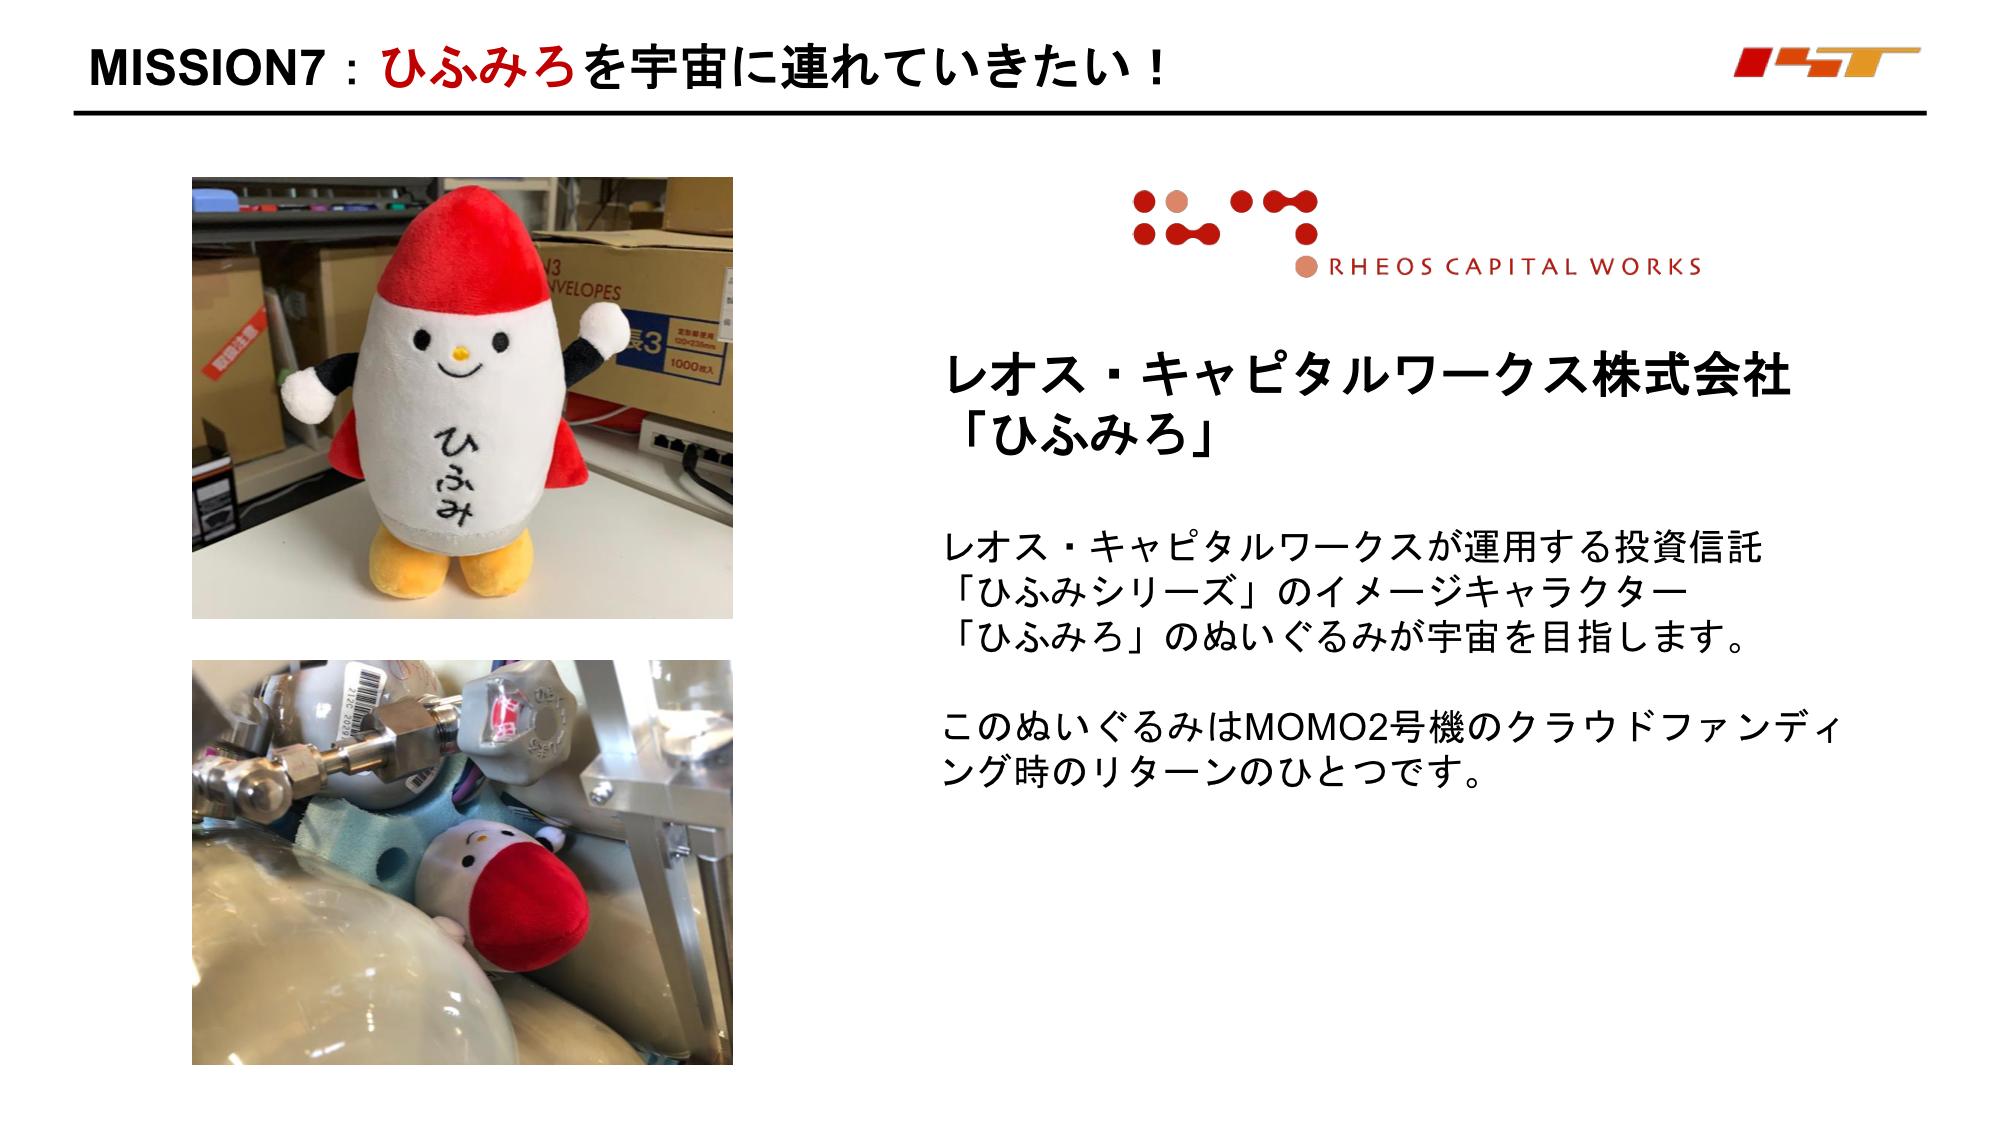 f:id:Imamura:20190628161358p:plain